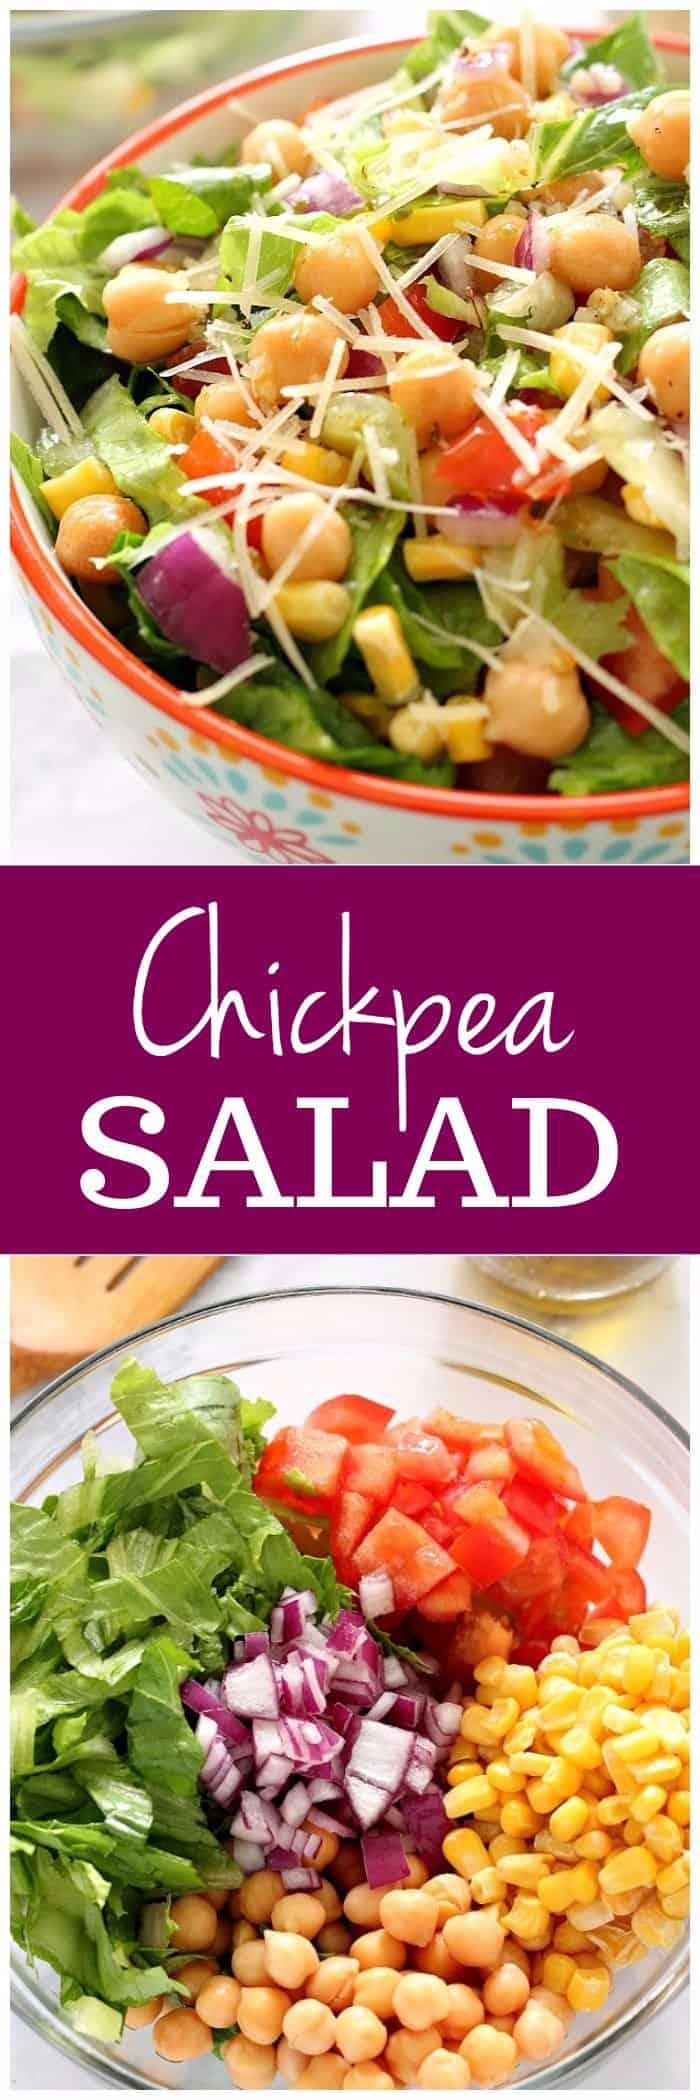 easy chickpea salad with garlic parmesan vinaigrette recipe long1 Chickpea Salad with Garlic Parmesan Vinaigrette Recipe